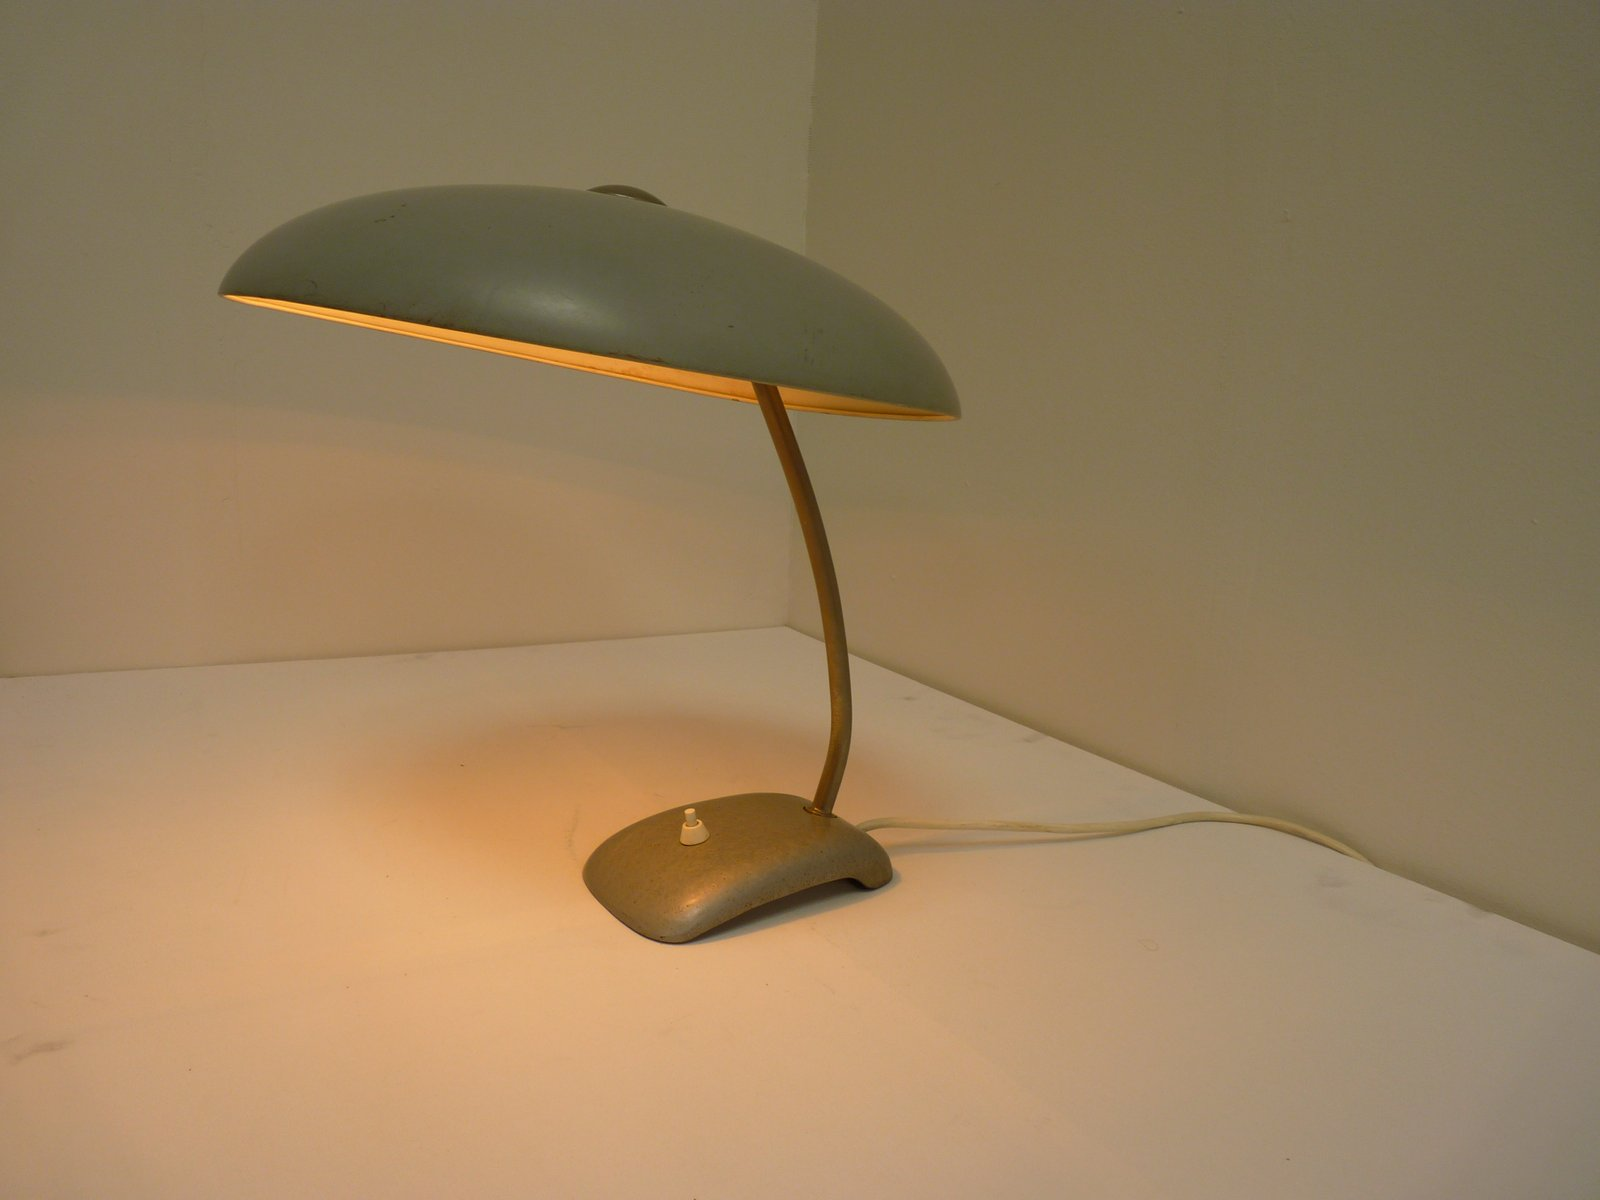 Vintage Bauhaus Tischlampe